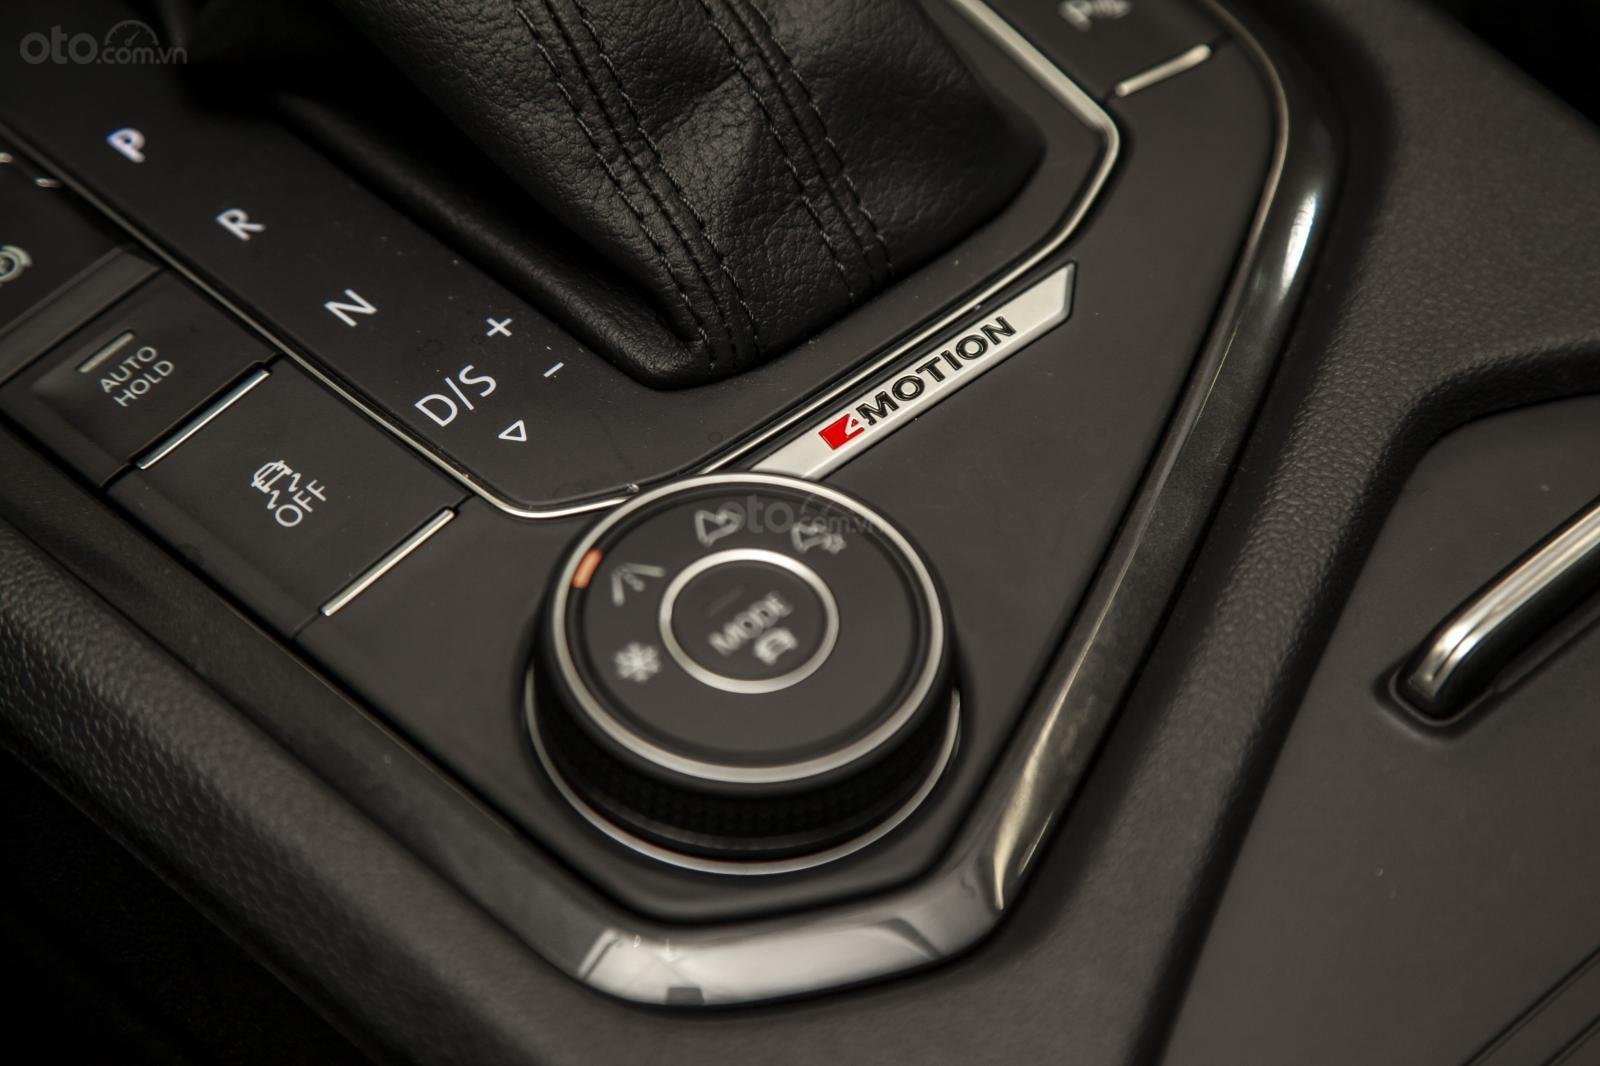 VW Tiguan Allspace Luxury 2019 - Đủ màu giao ngay. Hotline: 090-898-8862-3